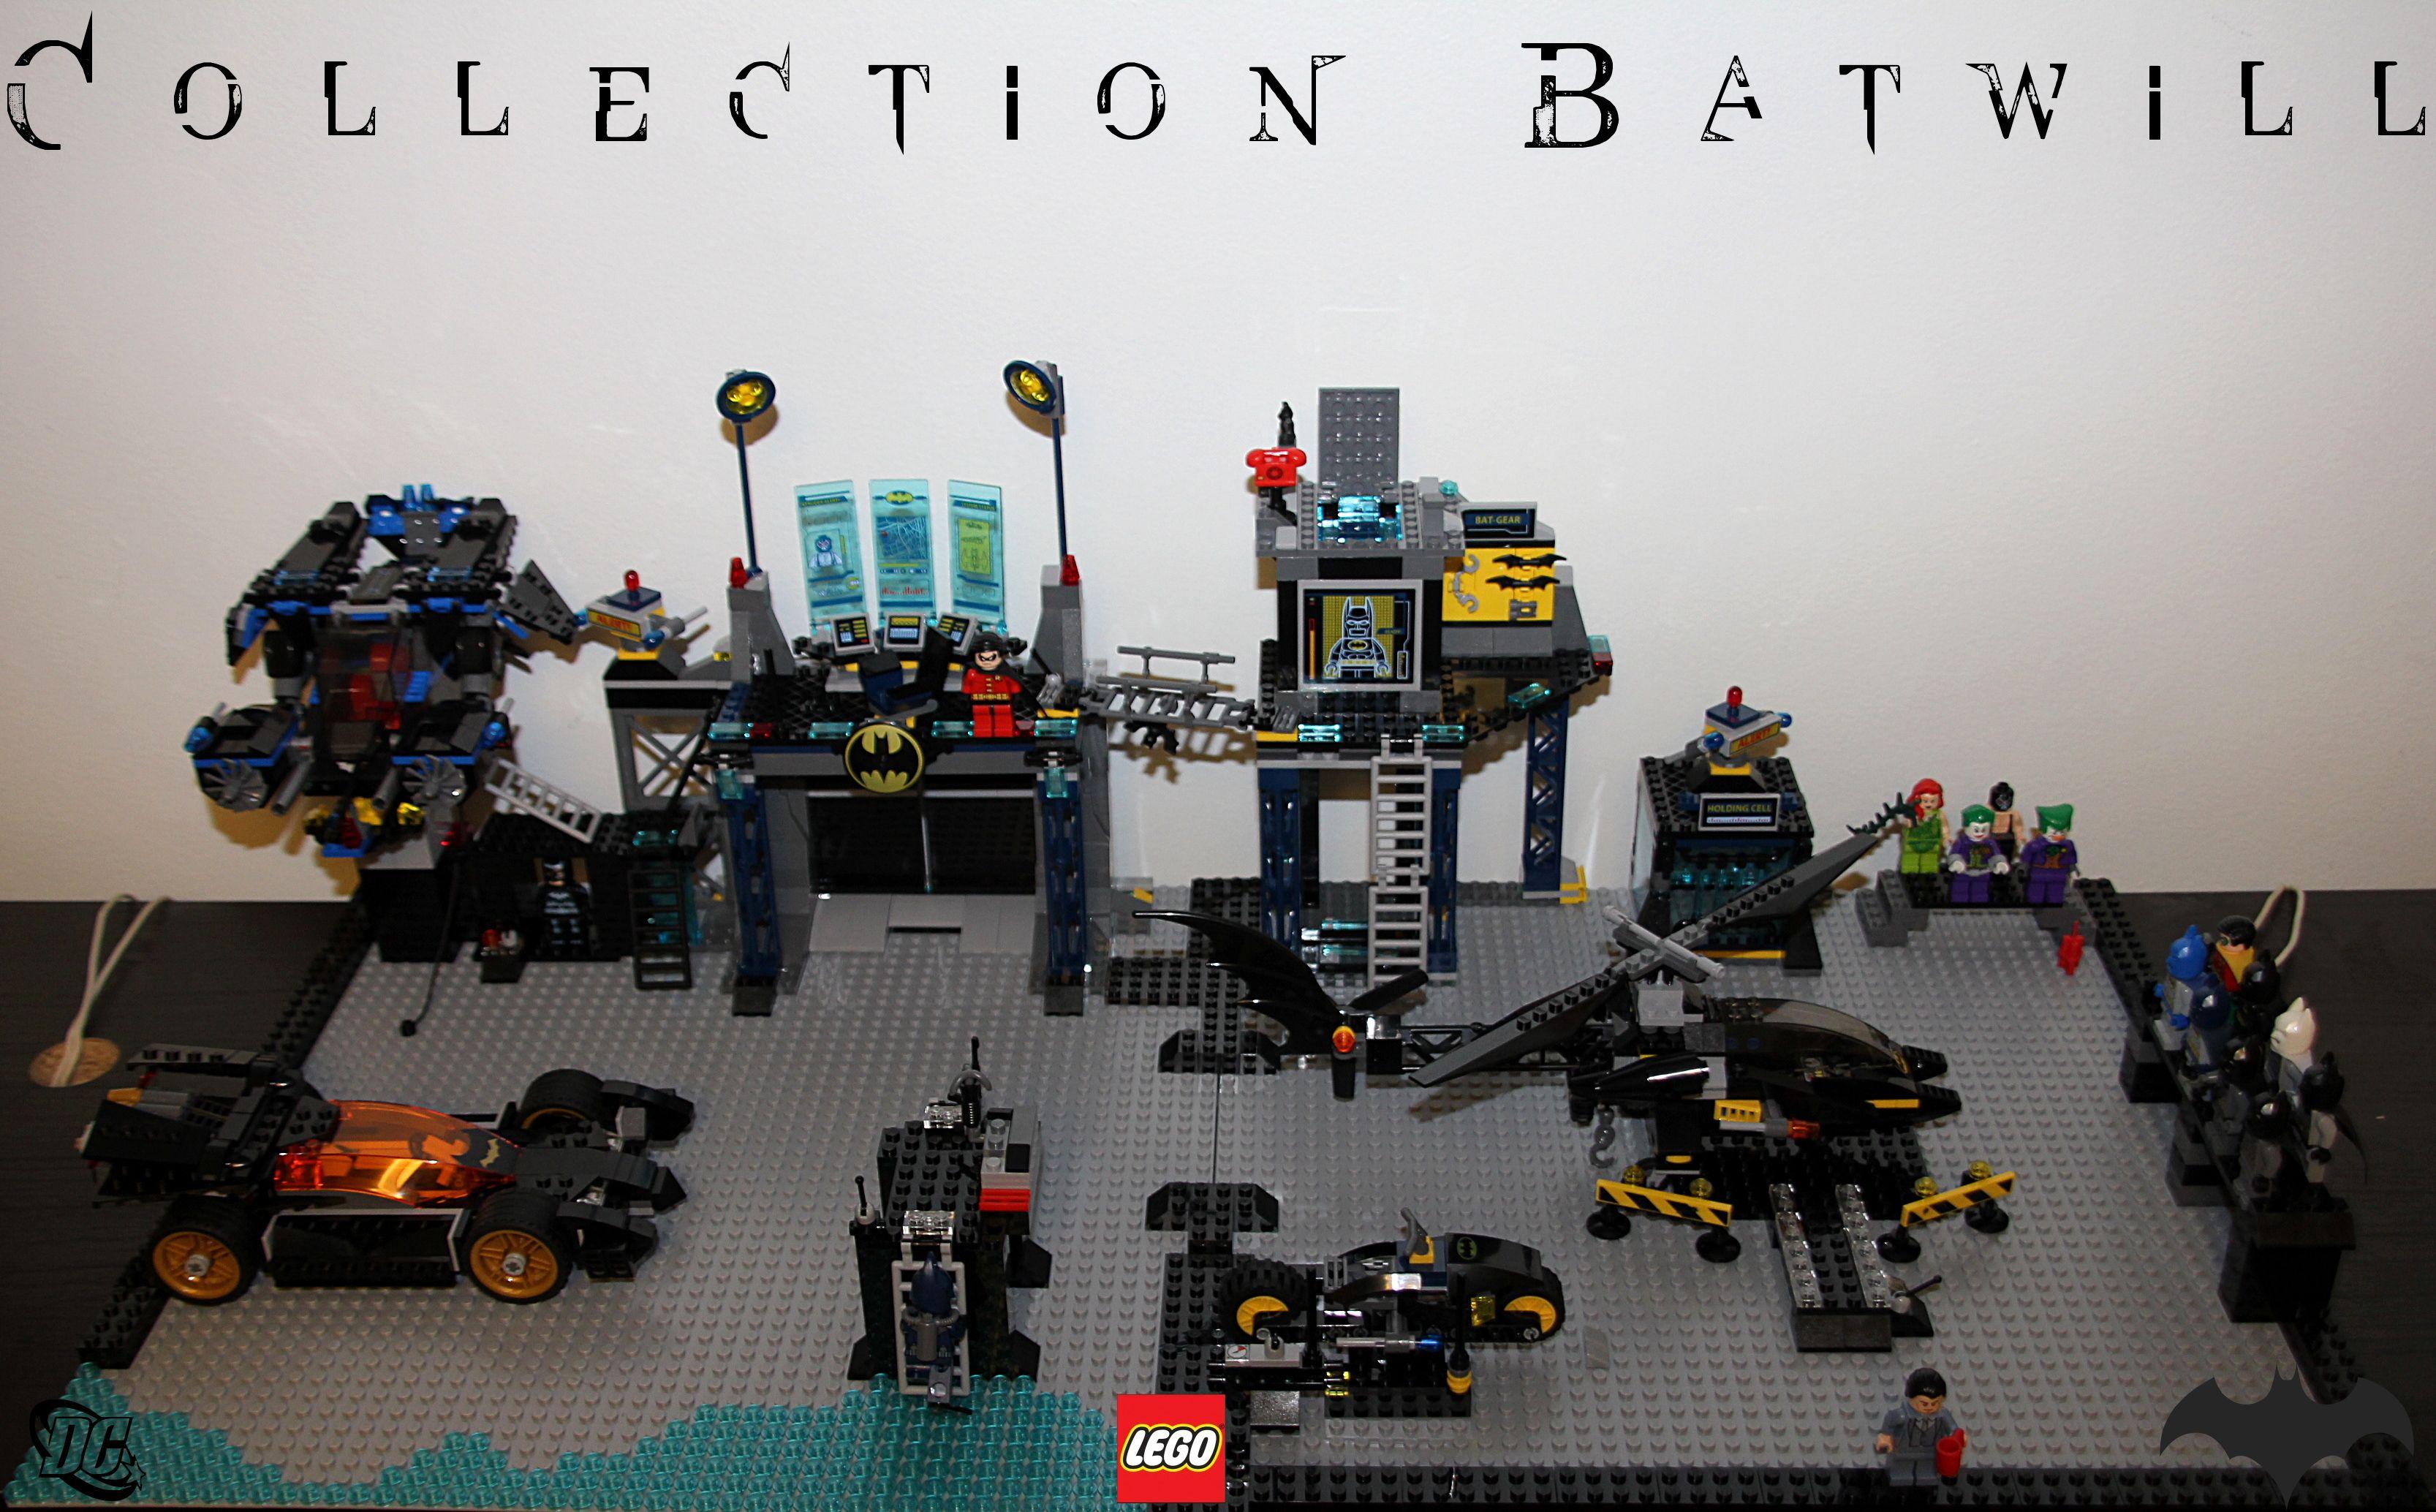 Batman Lego Batcave Custom Lego Pinterest Lego Batman And